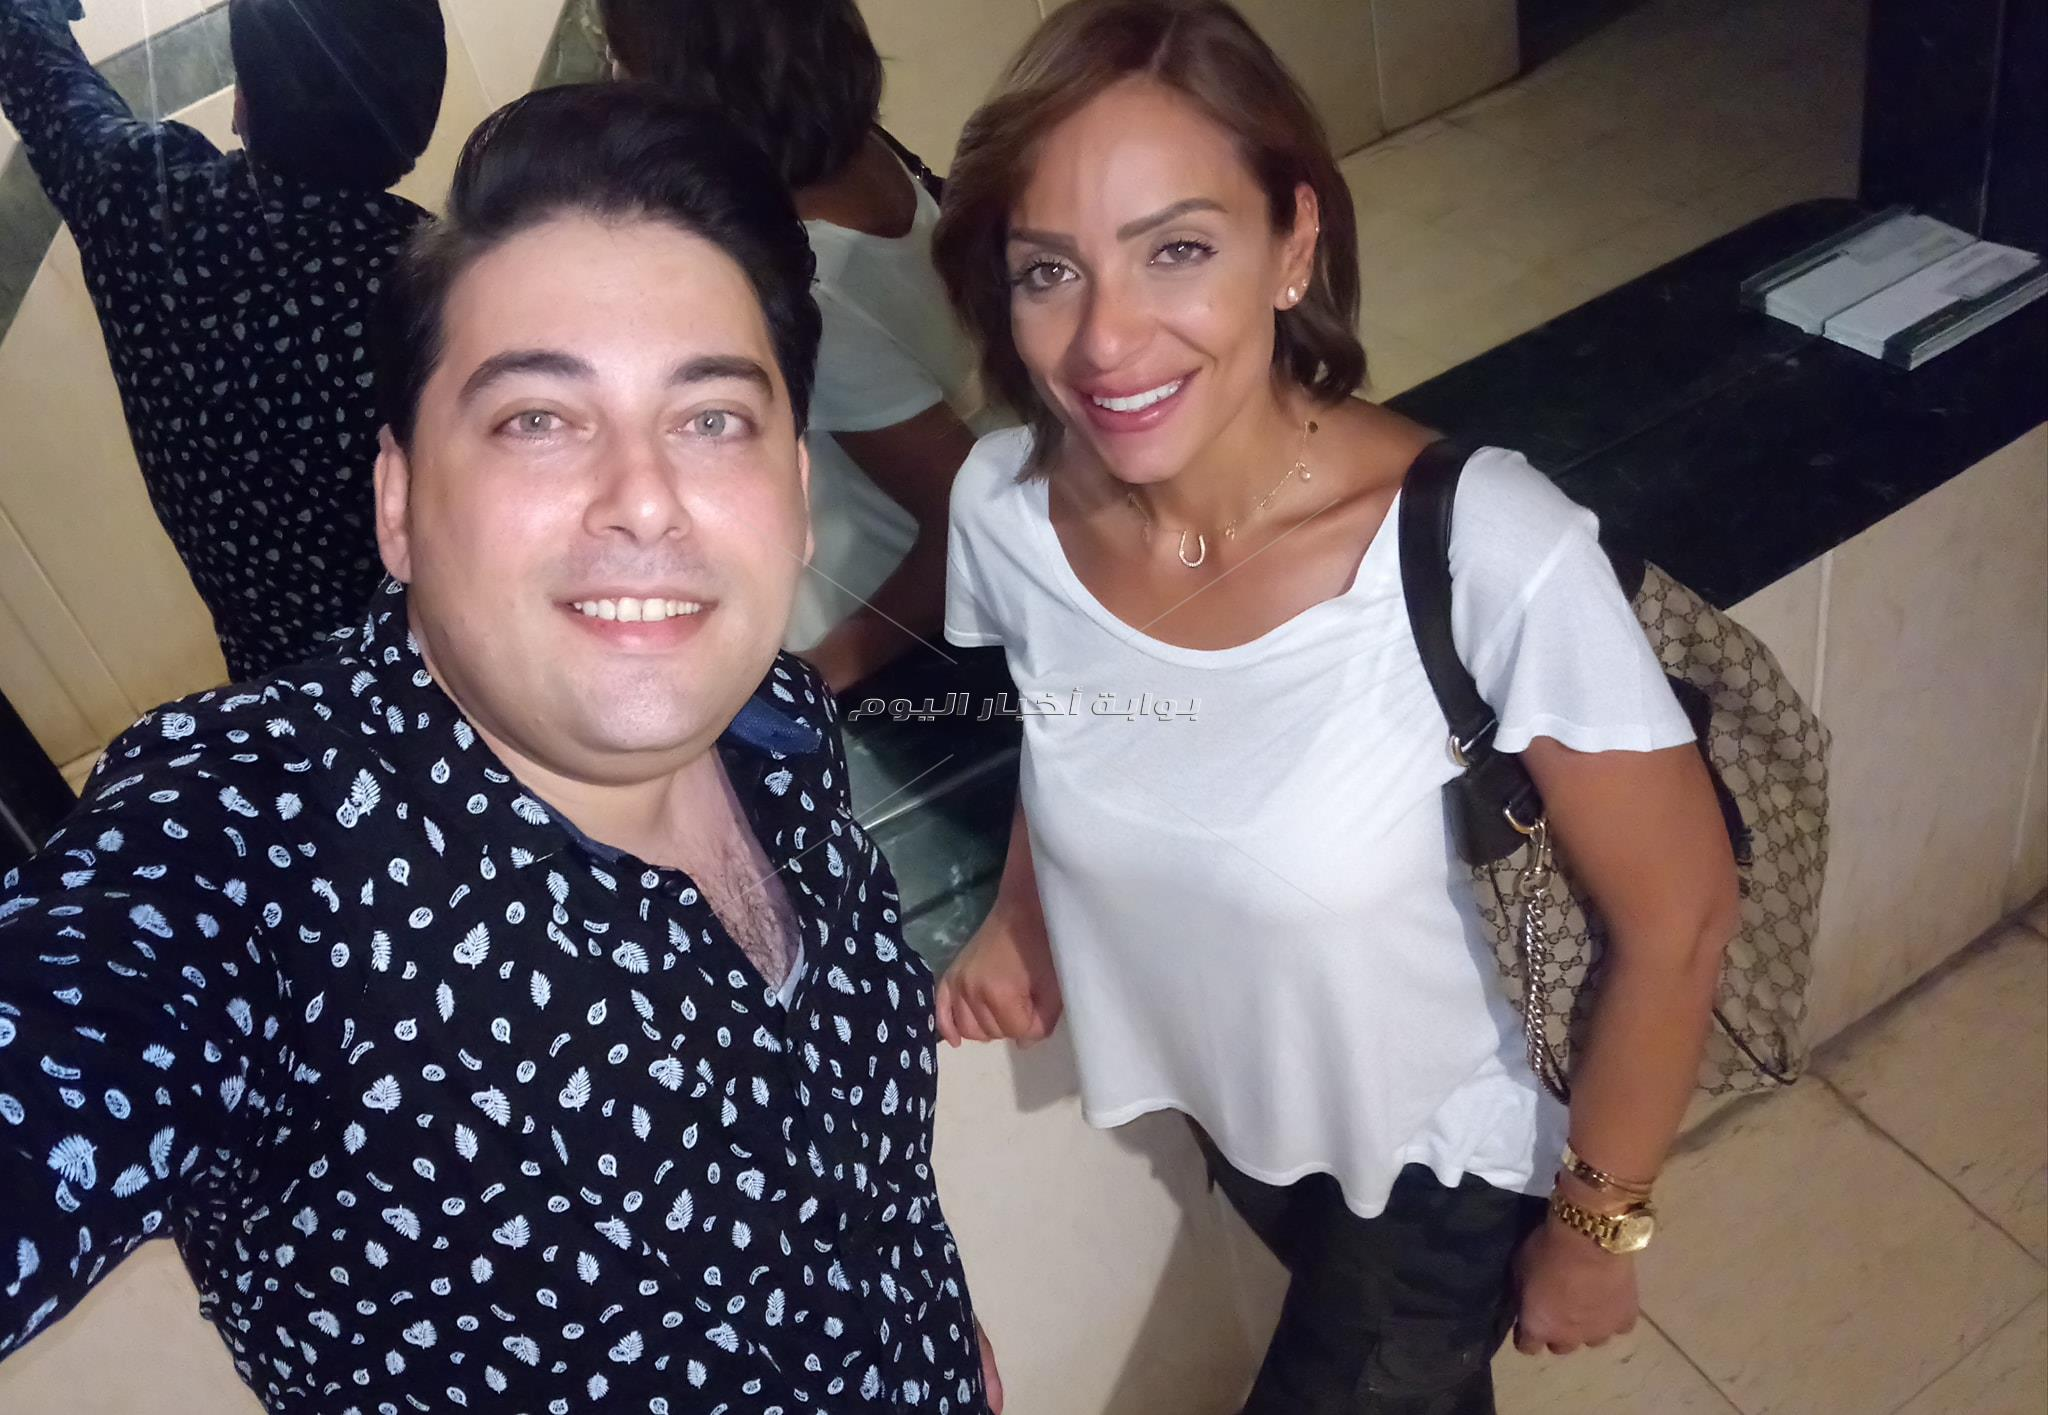 ريم البارودي وسالي عبد السلام تزوران إحدى دور الأيتام